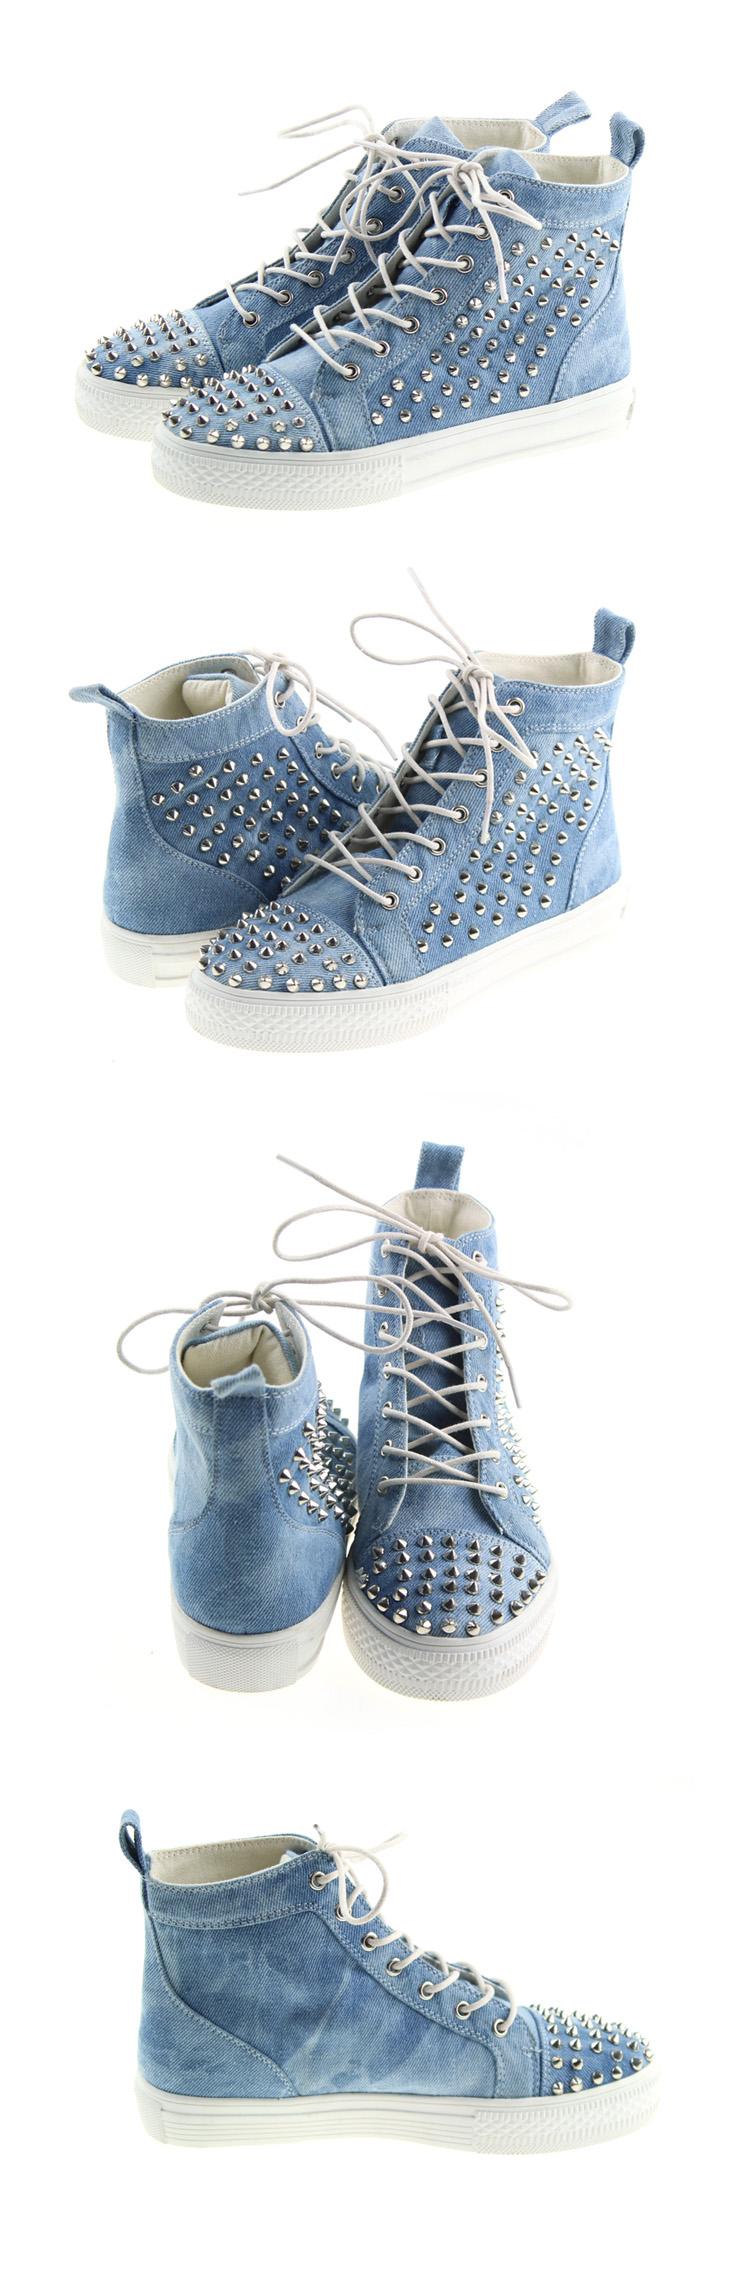 pinkyrose女款蓝色时尚女鞋1215452